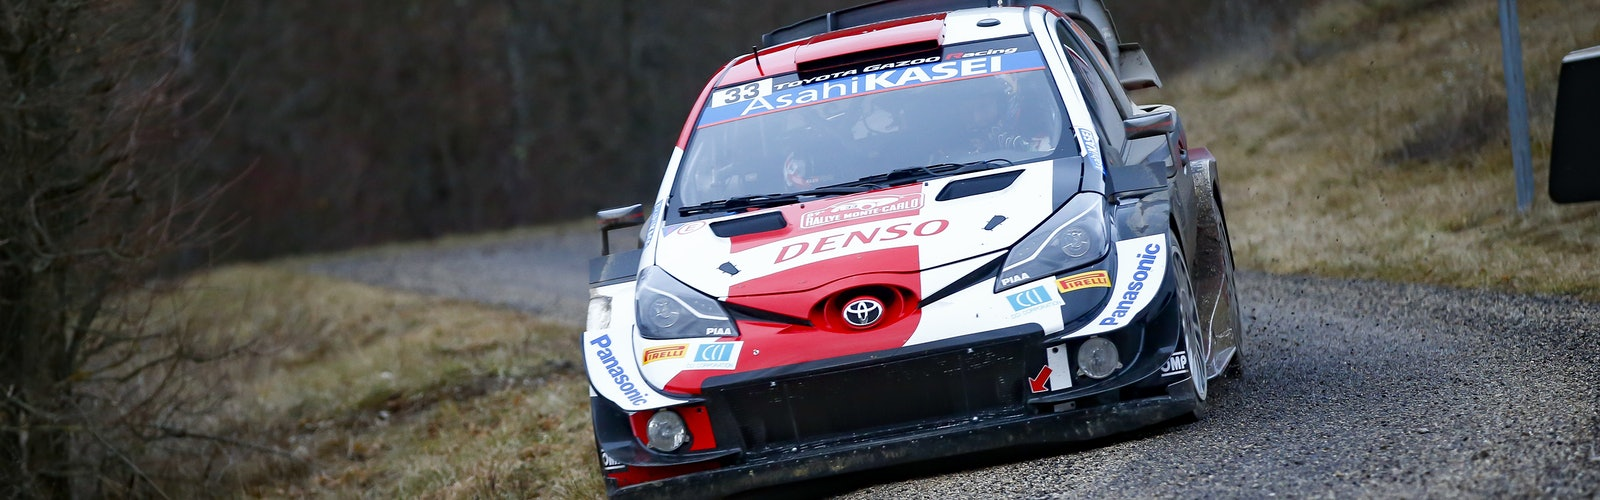 WRC_2021_Rd1._165